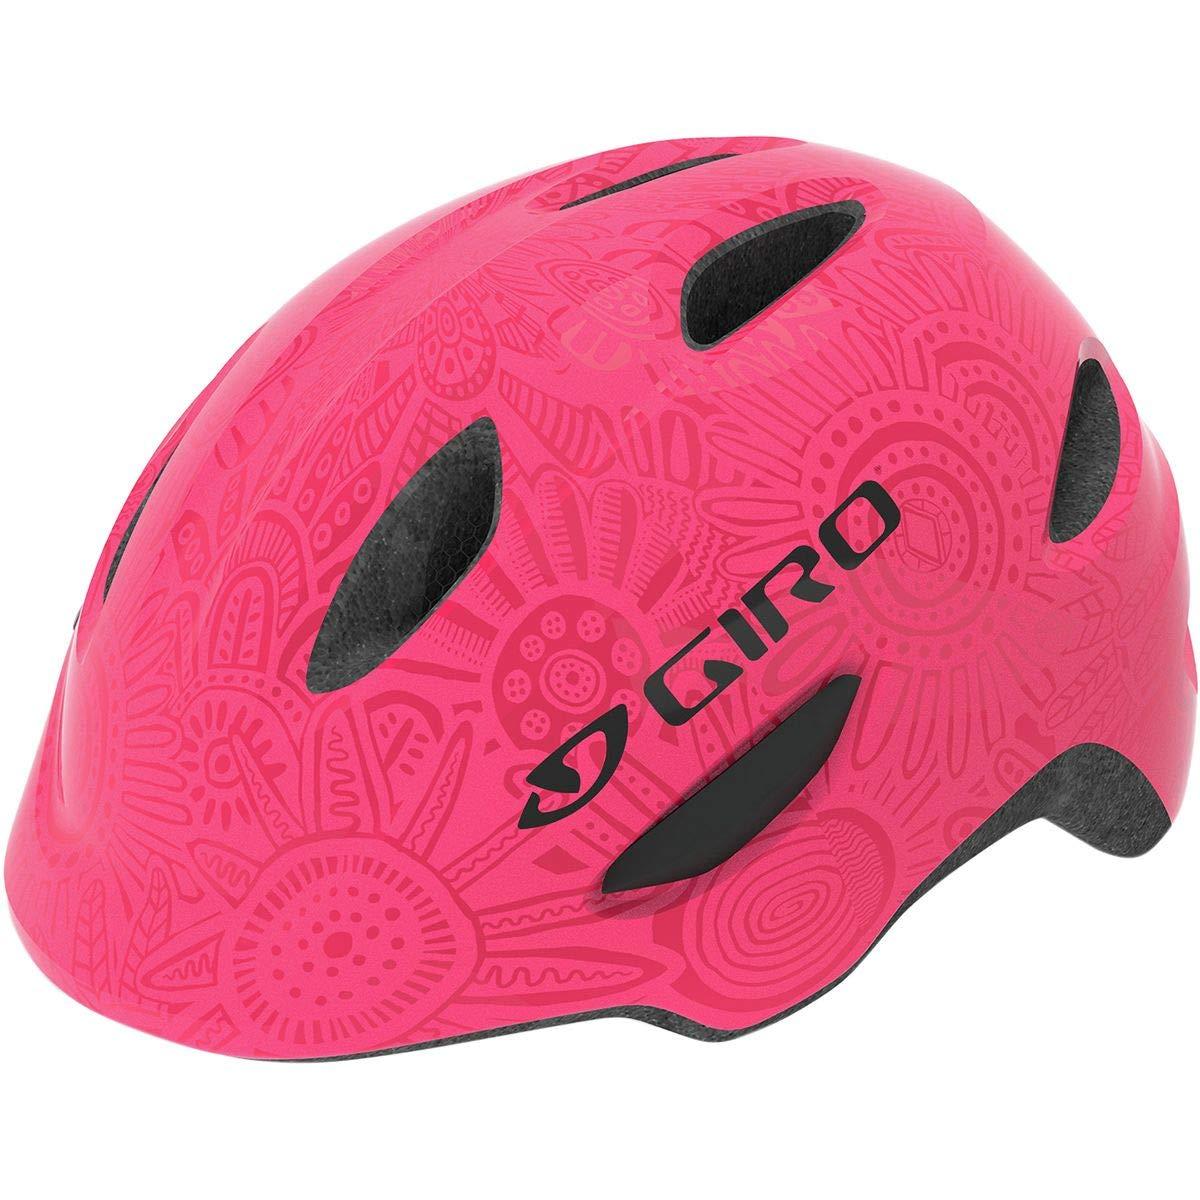 Giro Scamp MIPS Helmet - Kids' Bright Pink/Pearl, XS